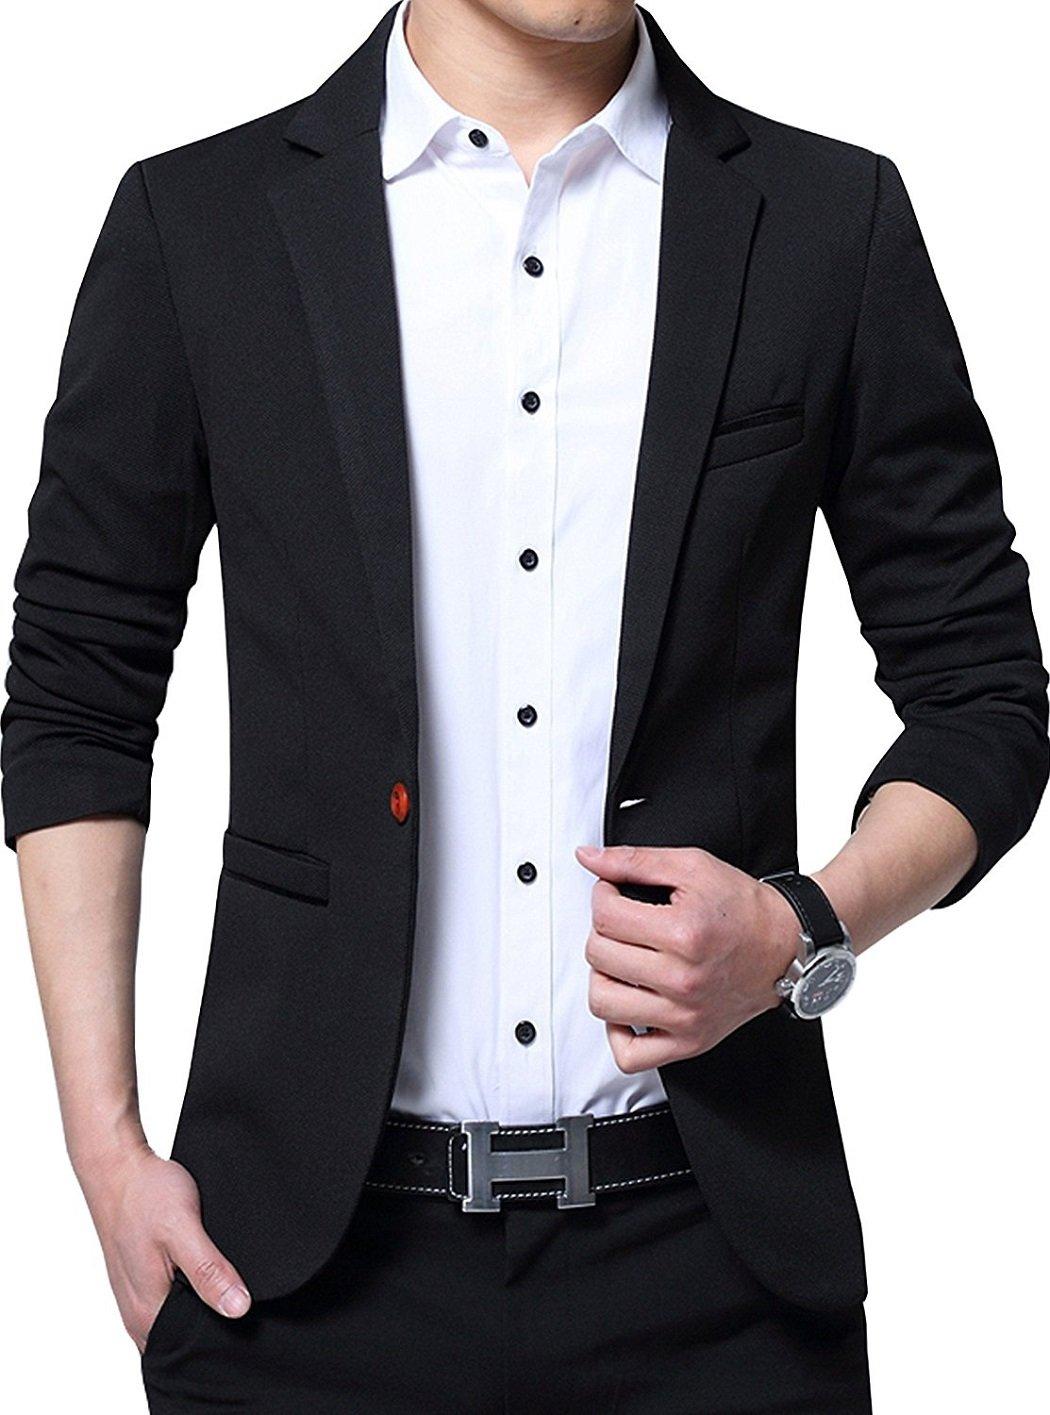 YIMANIE Mens Blazer Jacket Slim Fit Casual Single One Button Premium Lightweight Blazer Coat Black Medium